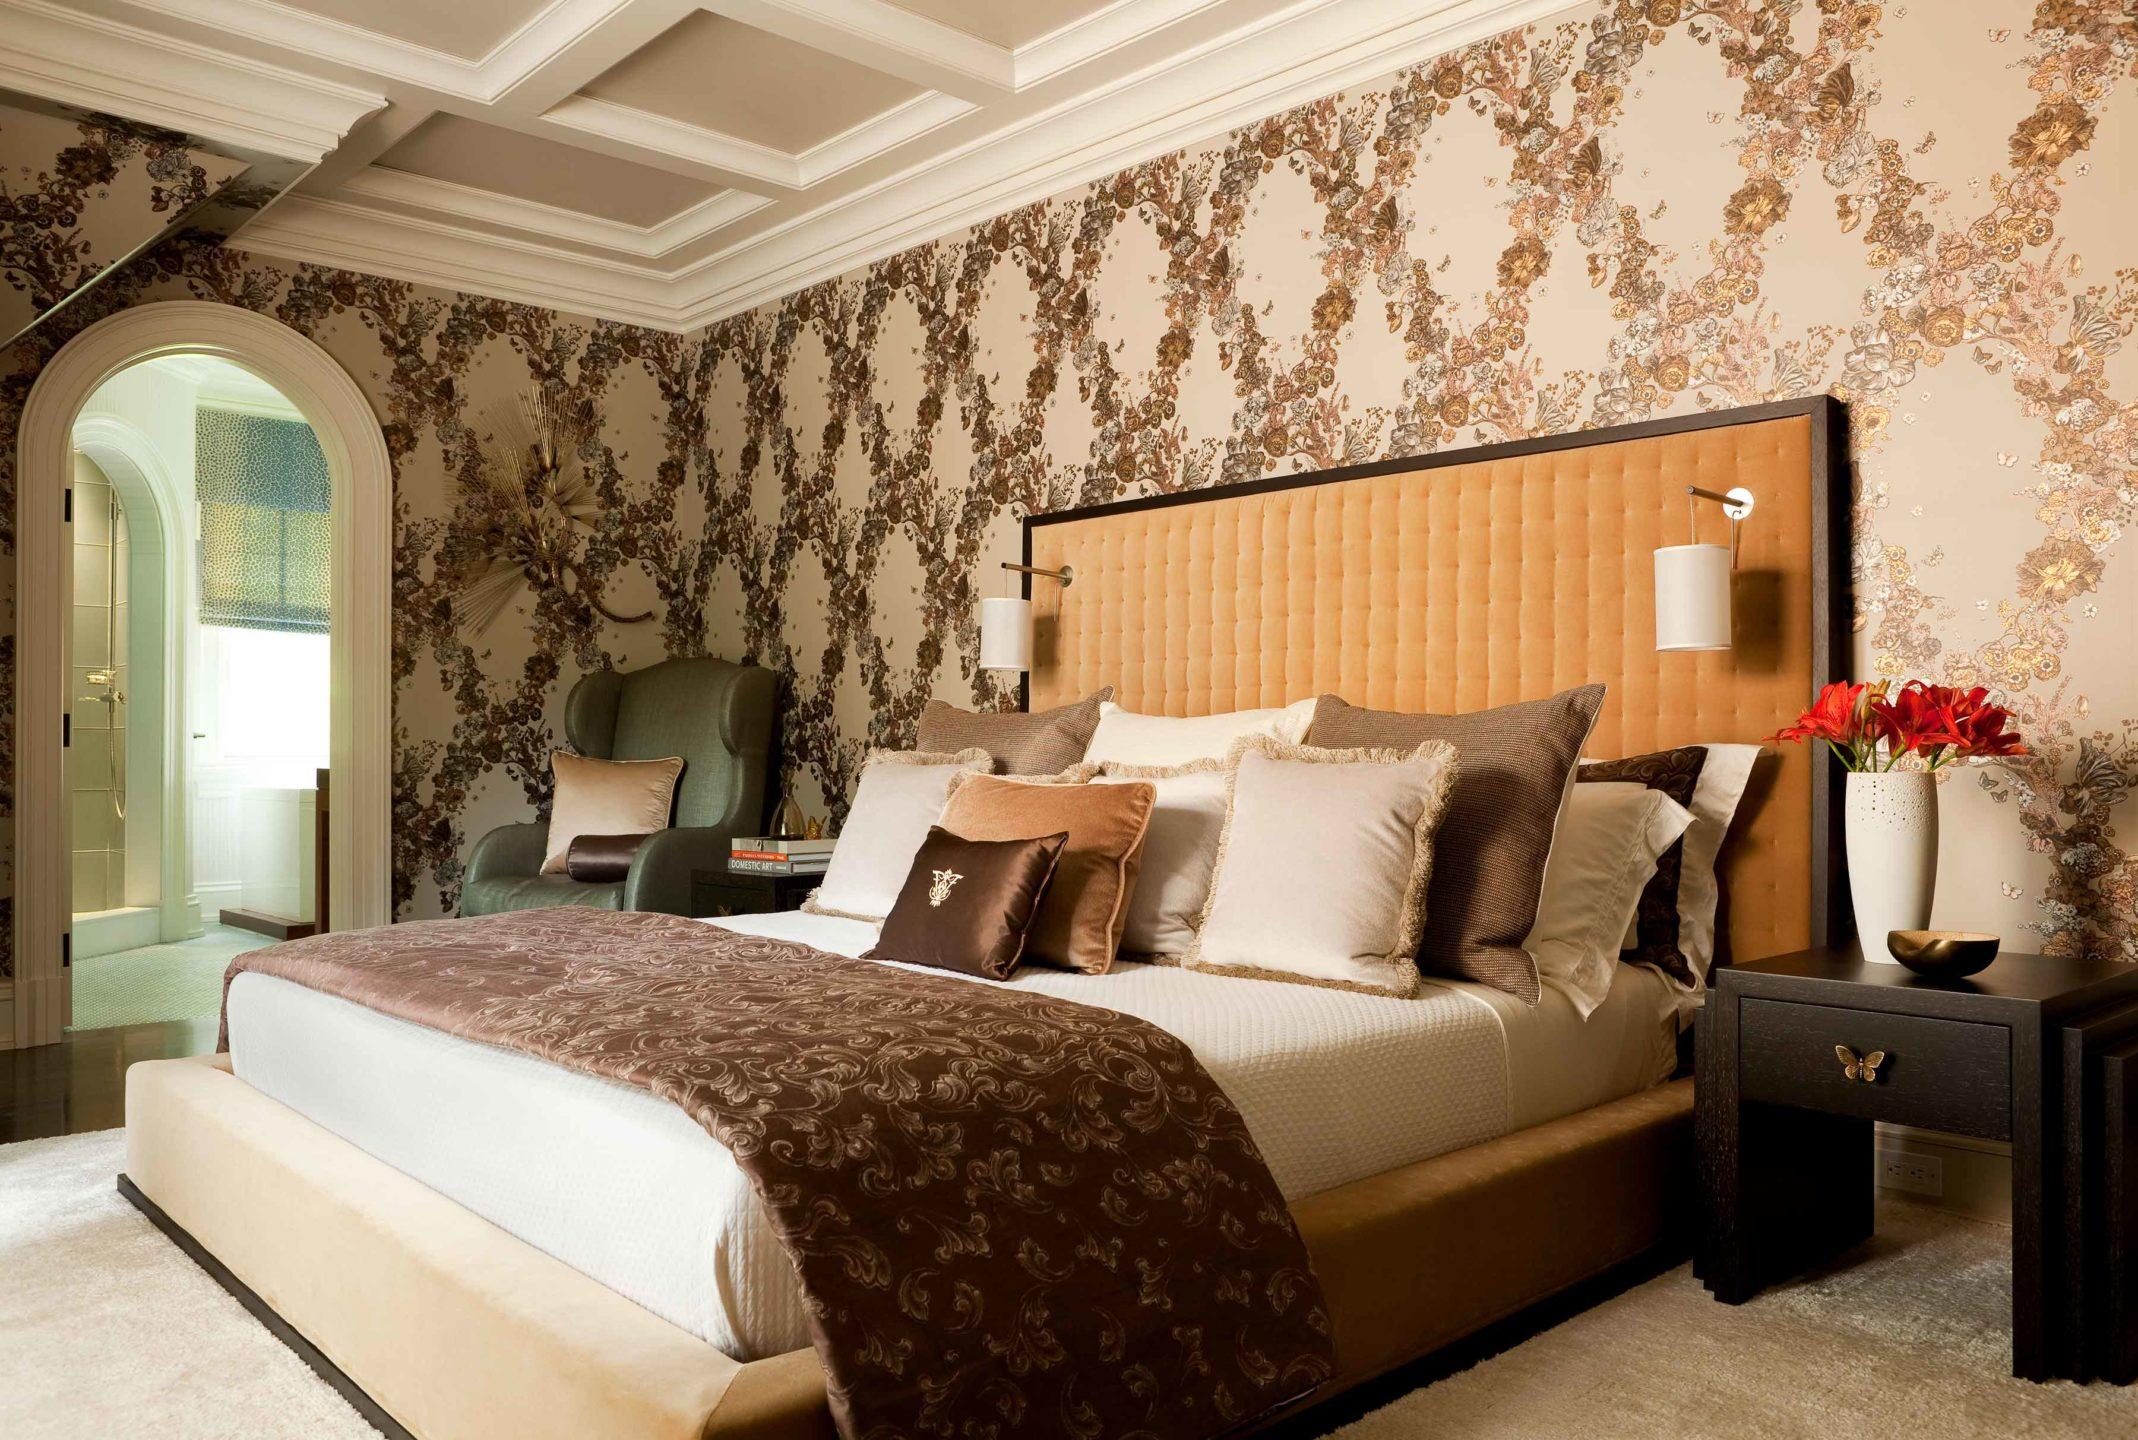 Nicole-Fuller-Interiors-Dutchess-Suffern-Estate-master-bedroom-chocolate-brown-caramel-coffered-ceiling-new-york-interior-designer